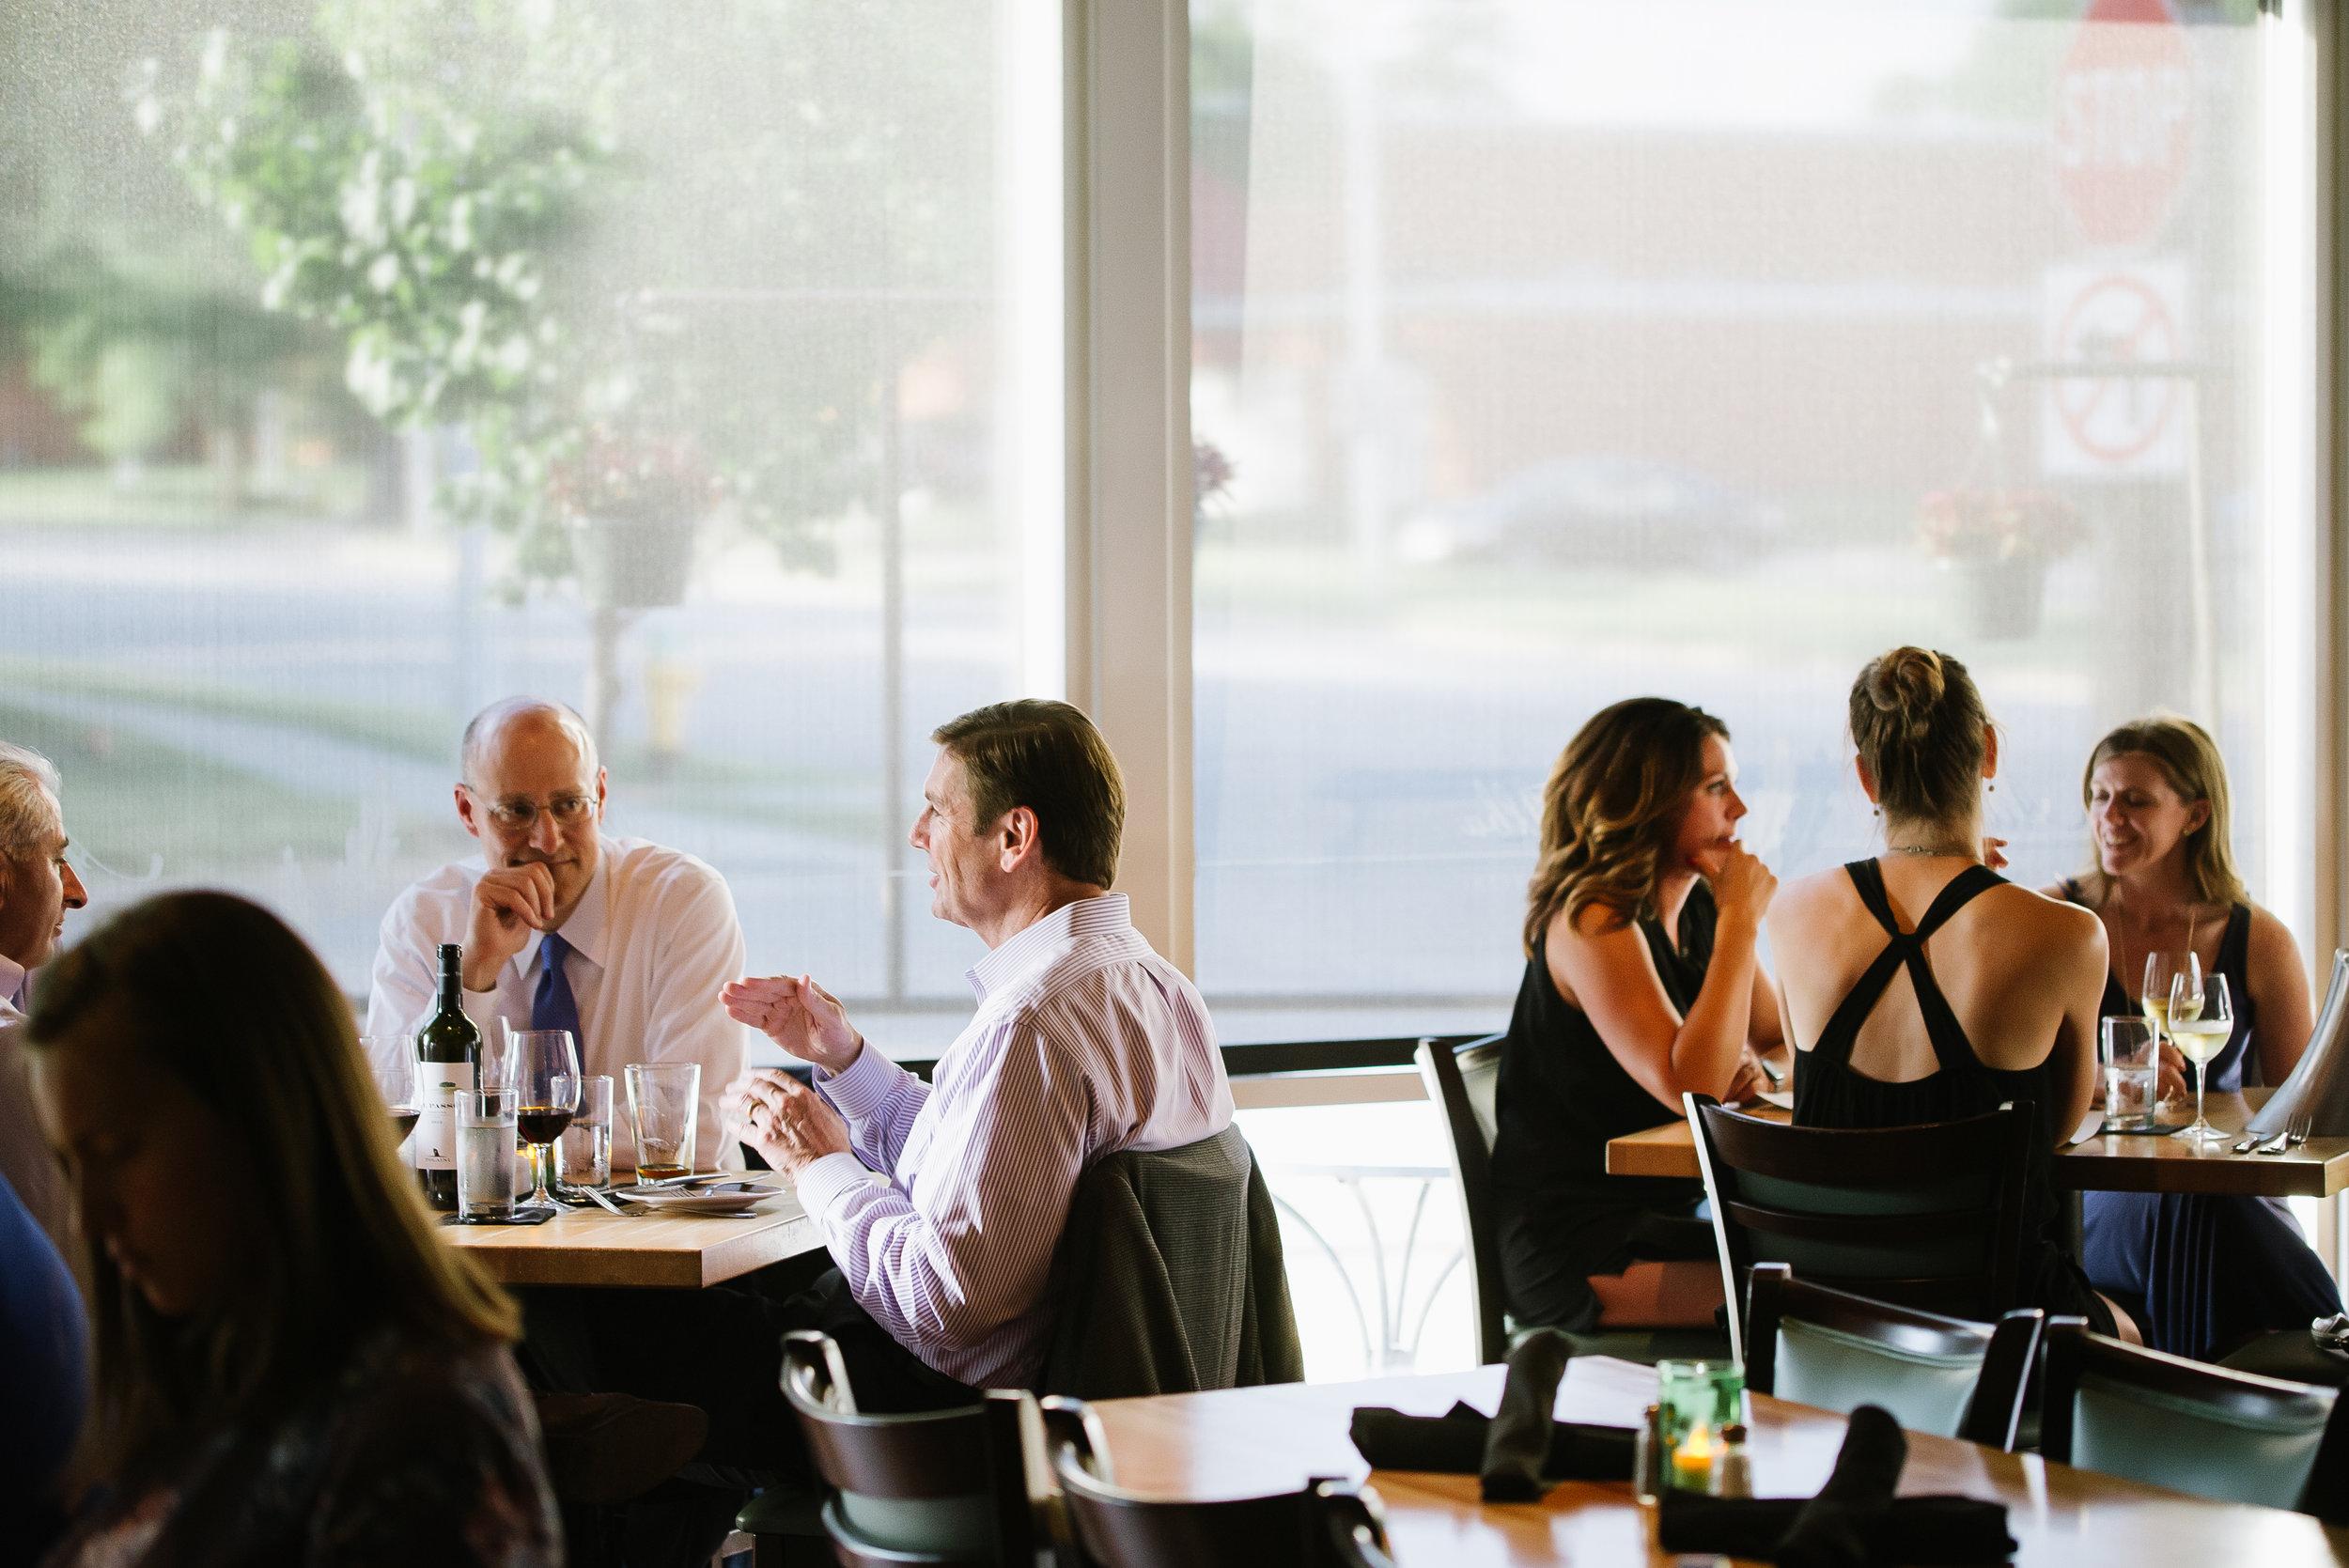 Alba Des Moines, Iowa Restaurant Meeting 2